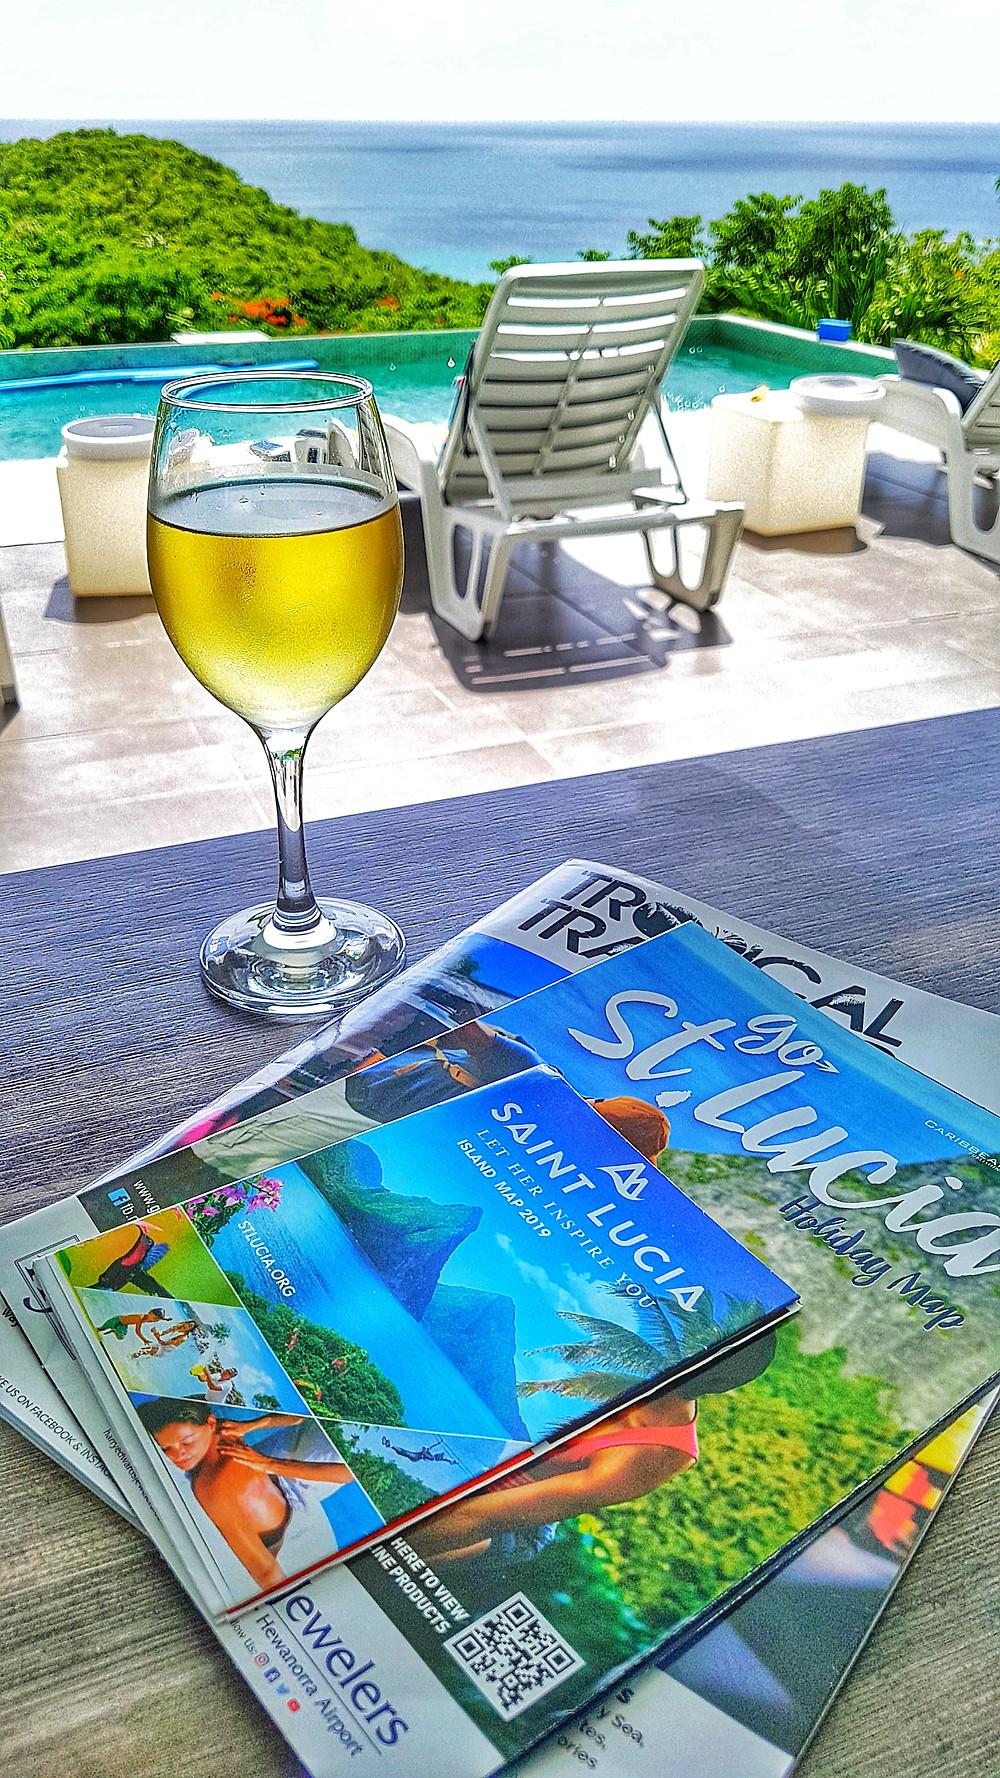 Chantelle Tatyana blog - St Lucia brochures